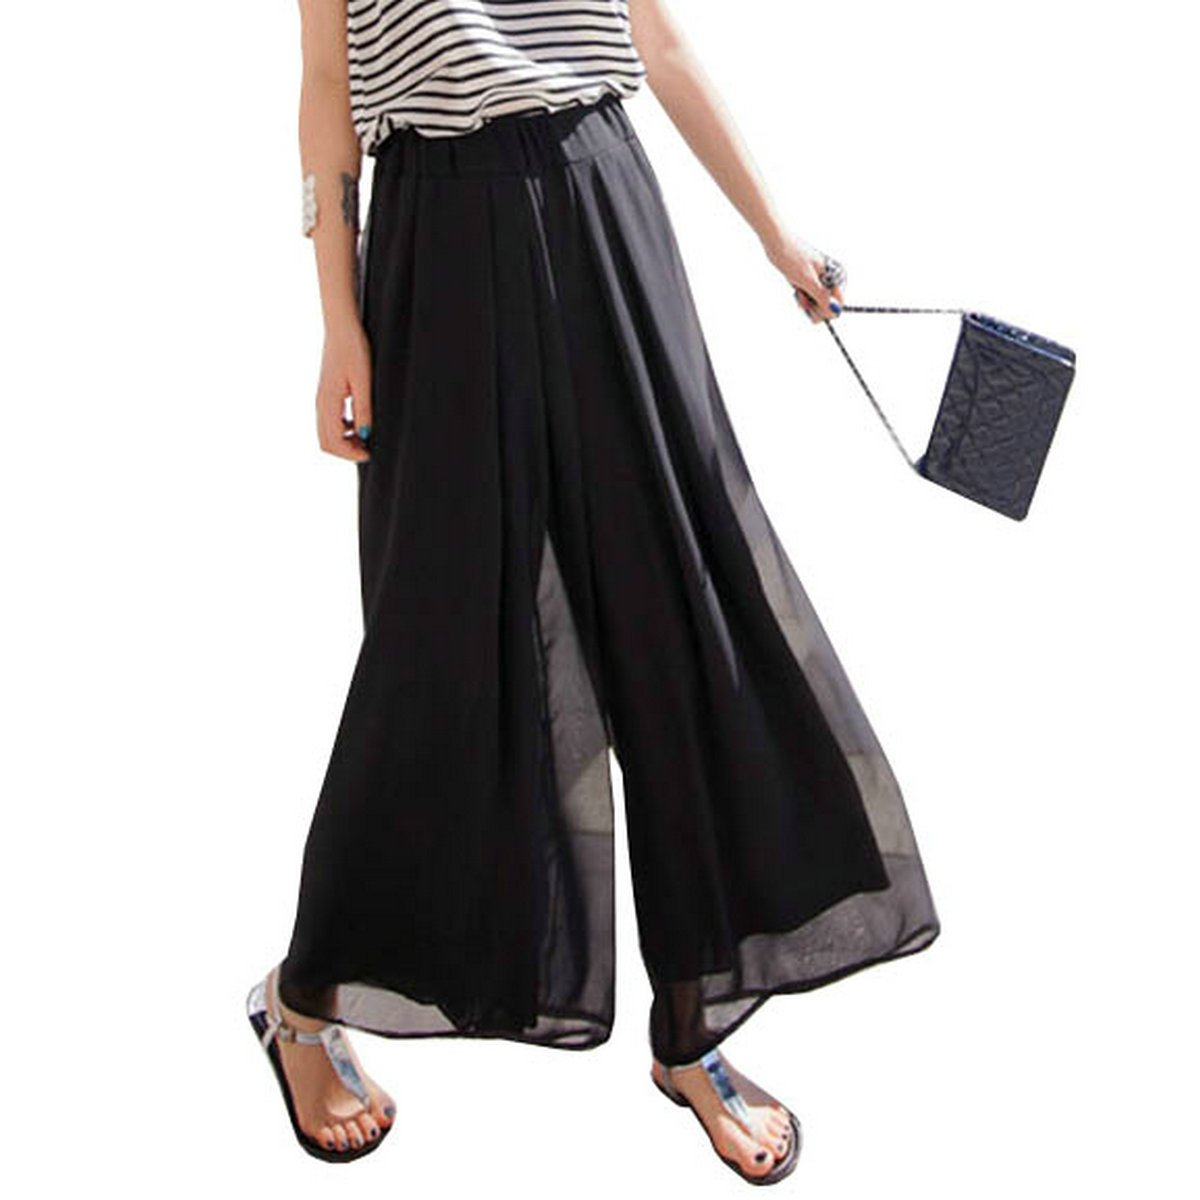 Joyci Fashion High Waist Chiffon Split Skirt Culottes Pants (Style B Black)